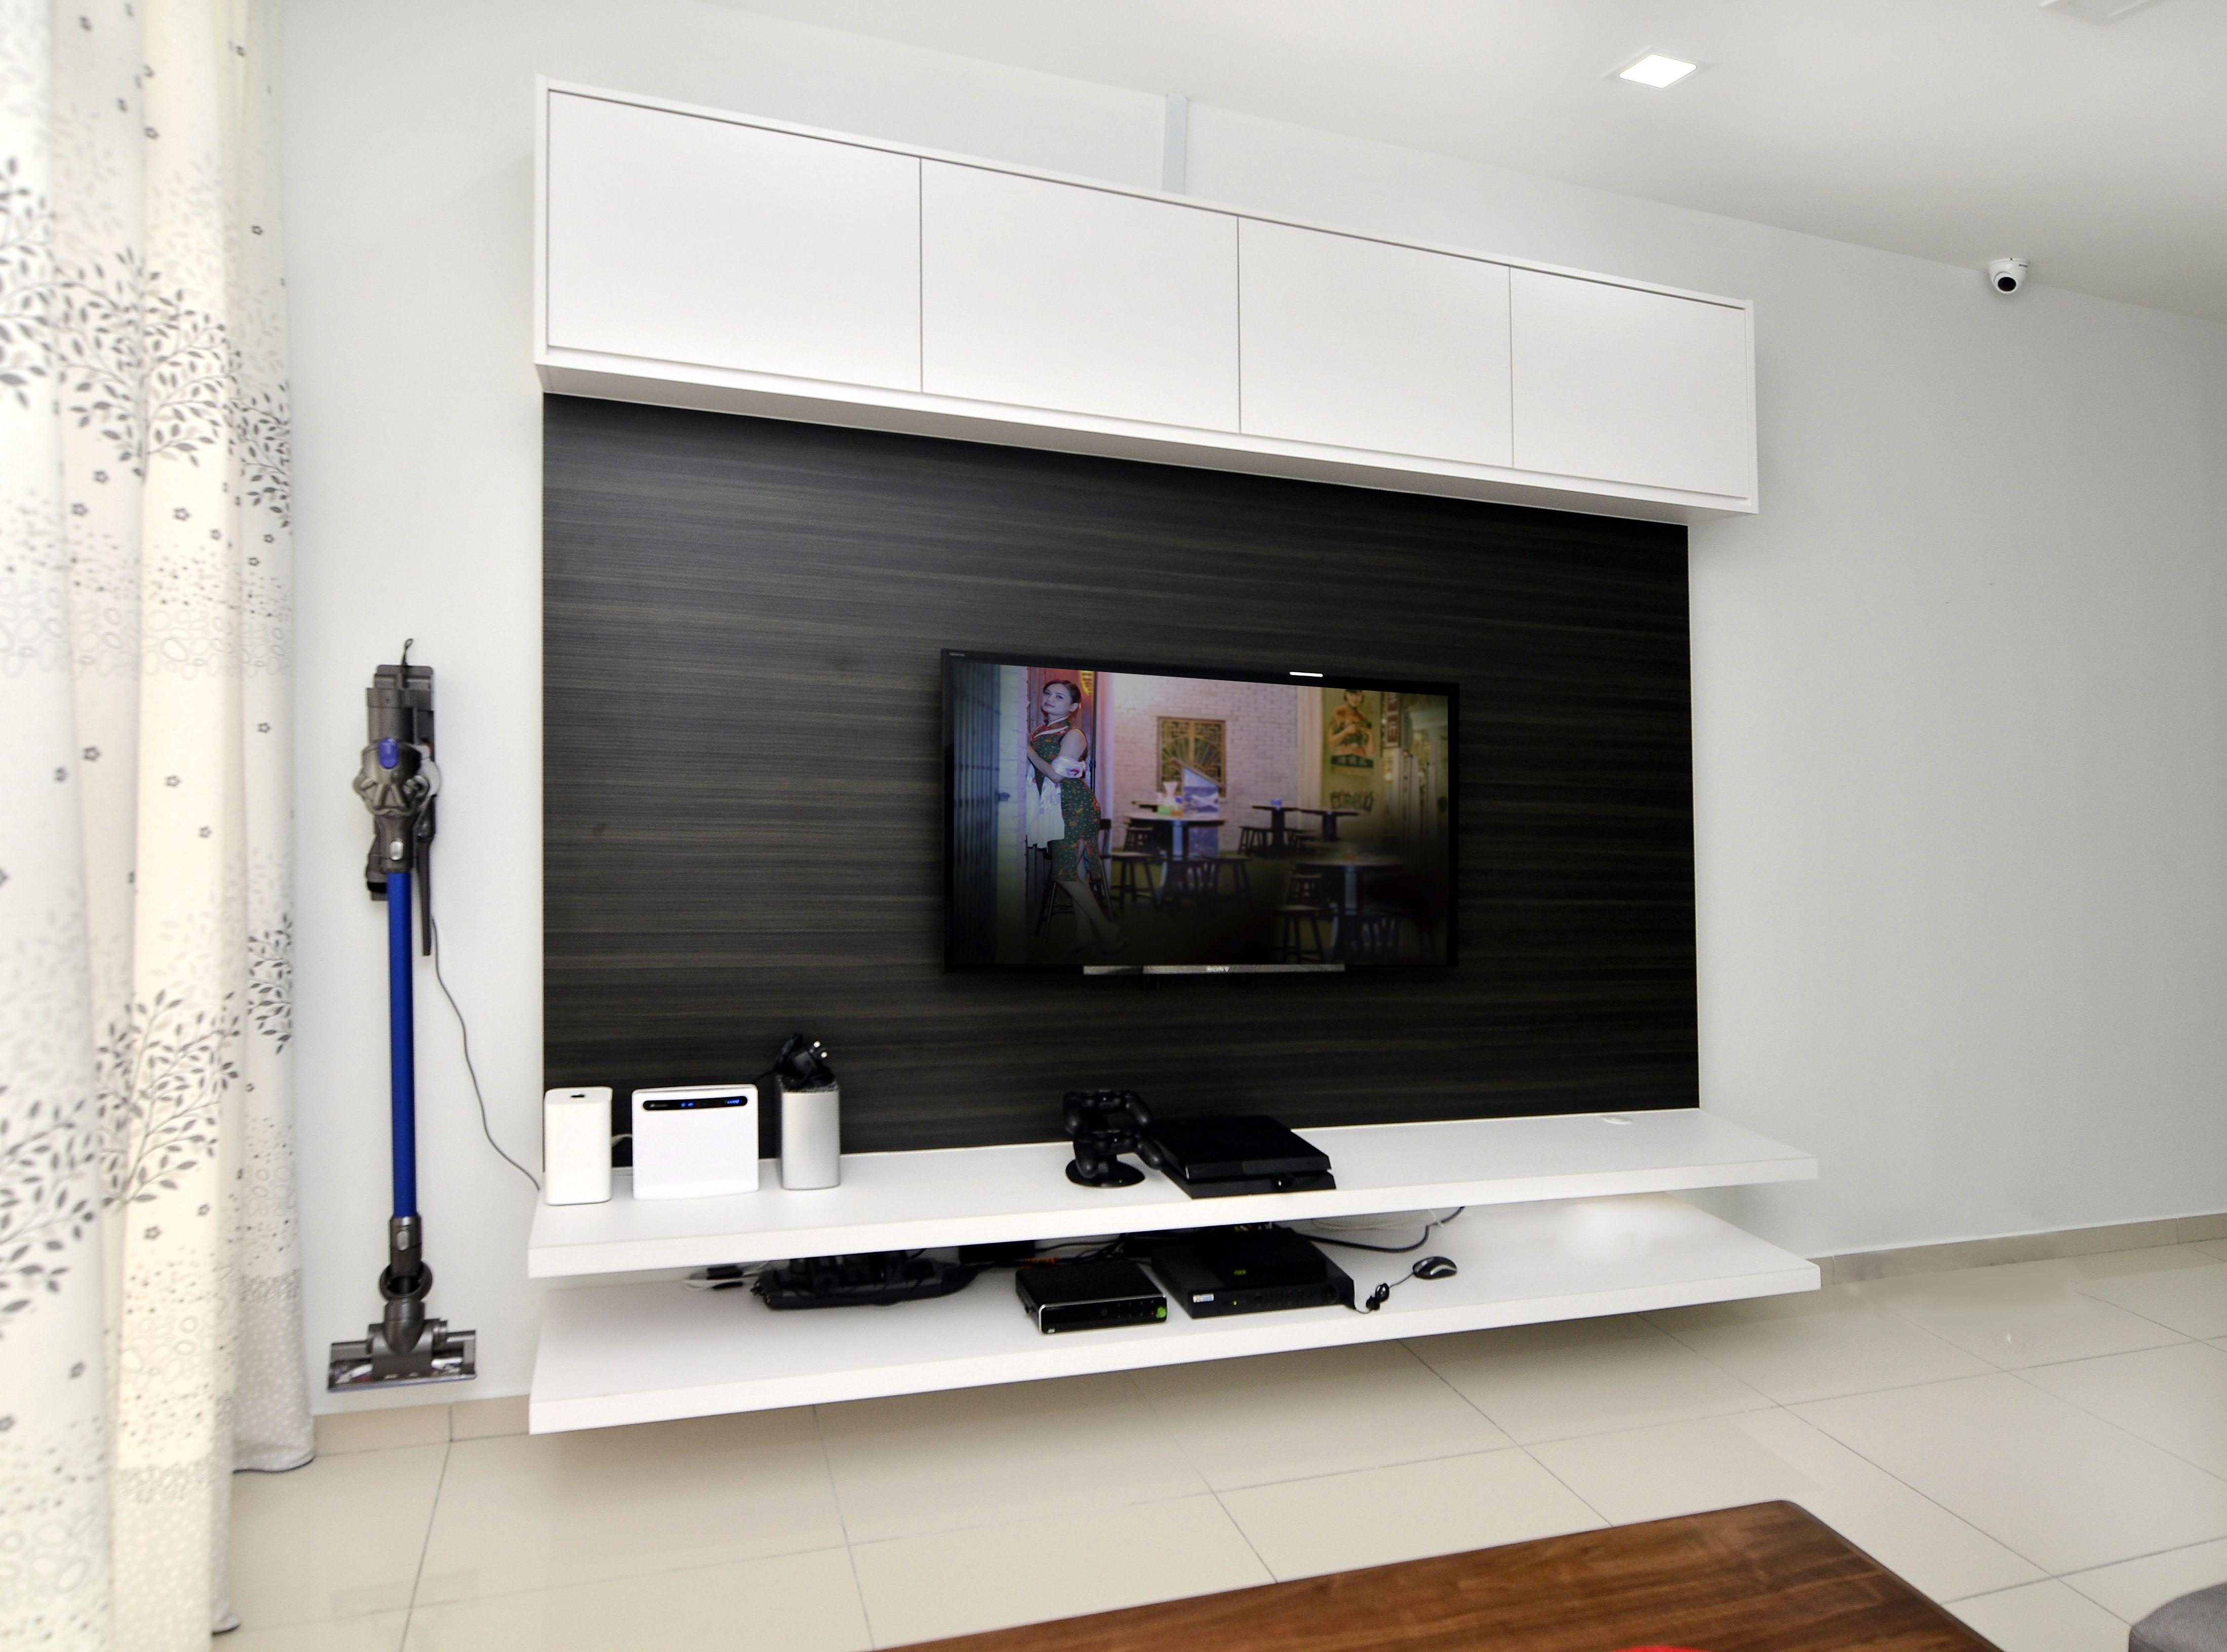 #tv #console #cabinet #white #laminate #wood #livingroom #design